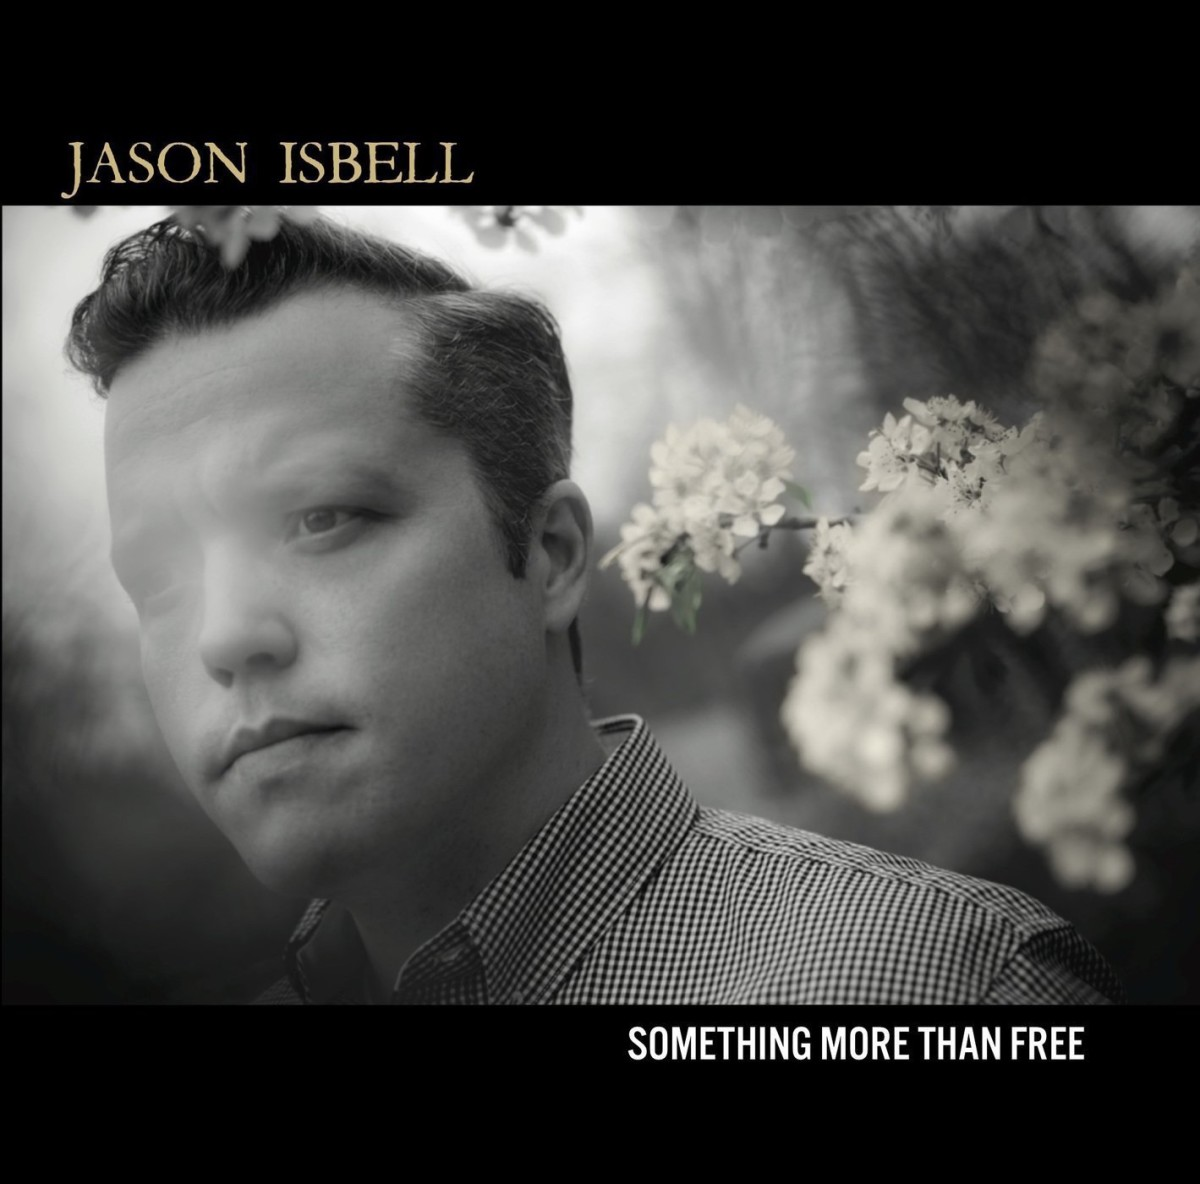 Jason Isbell - Something More Than Free artwork